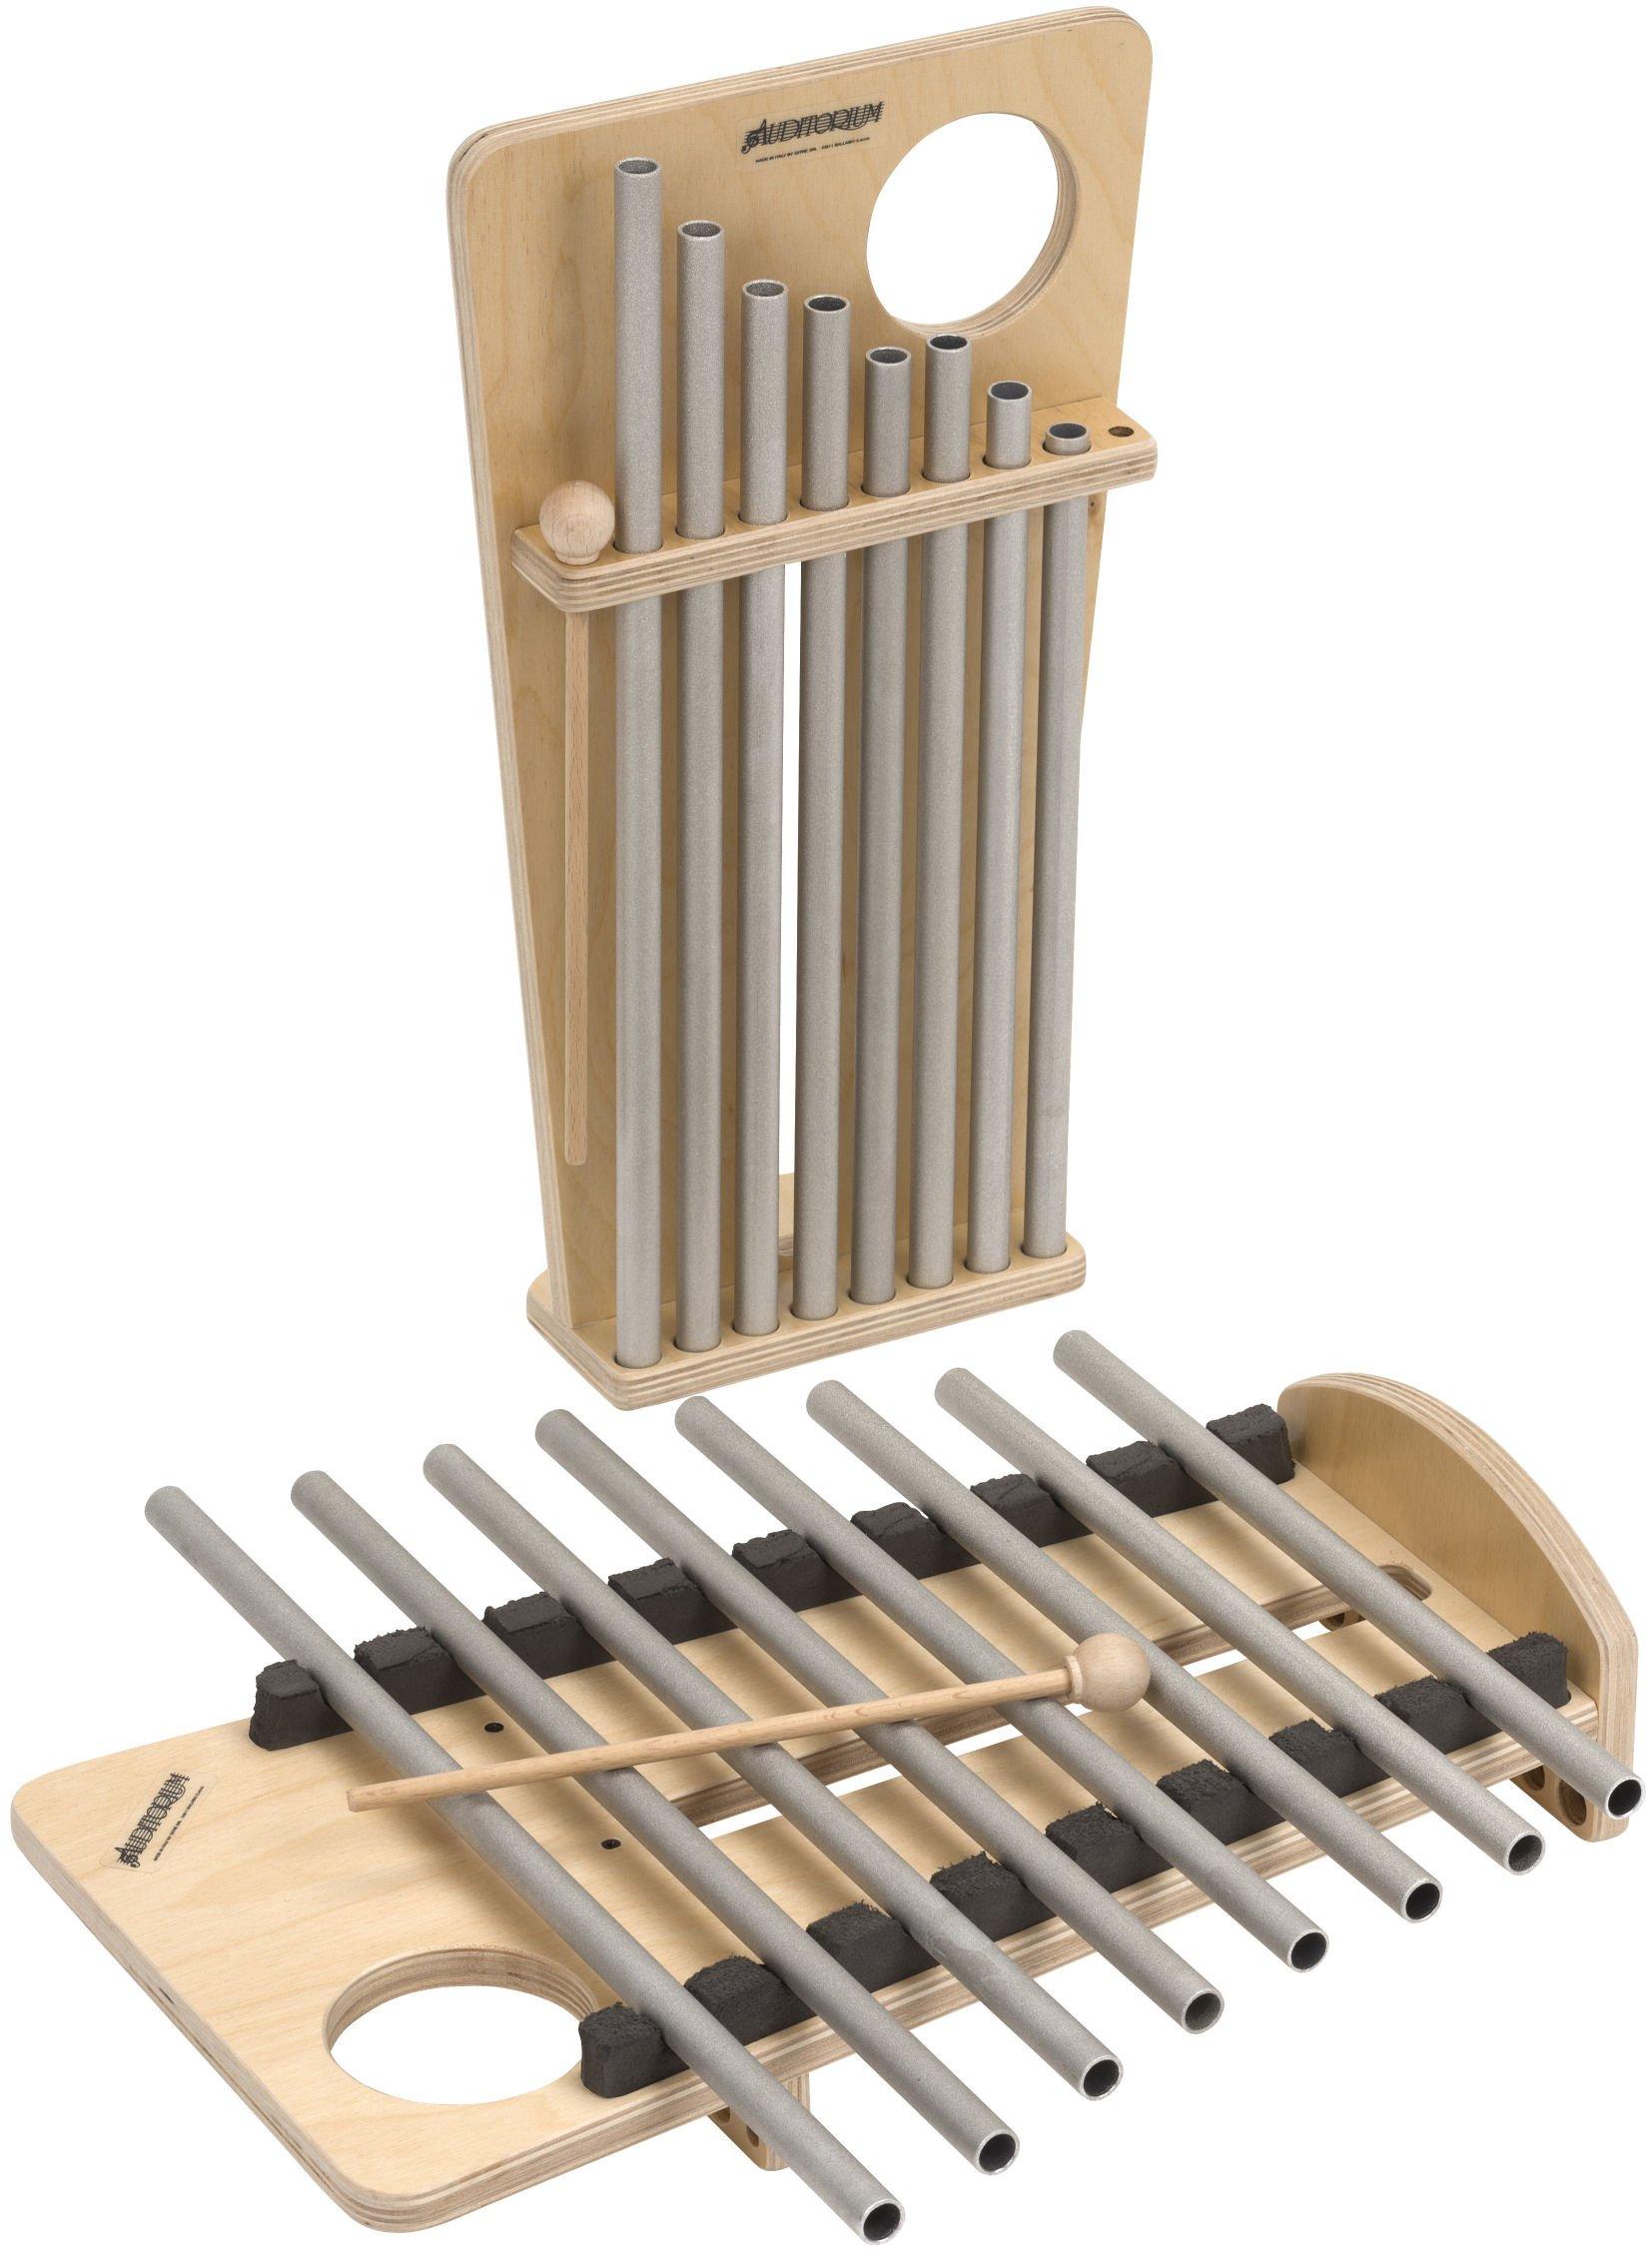 Gitre 7800 21 x 37 cm Organ Tubaphone